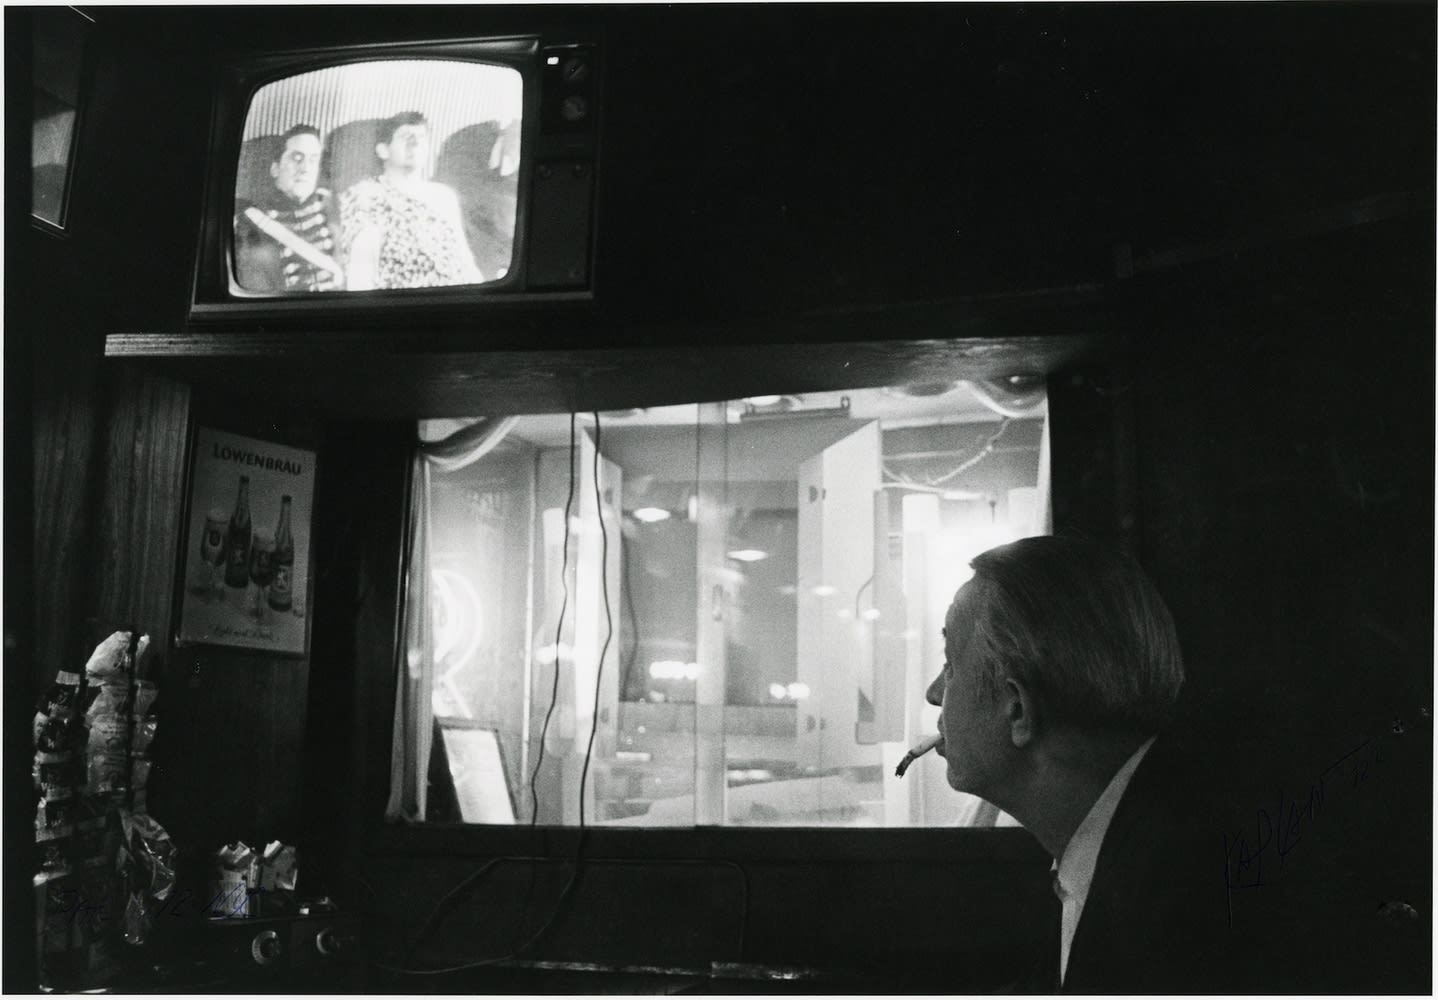 Sid Kaplan, Bar, New York City, 1972